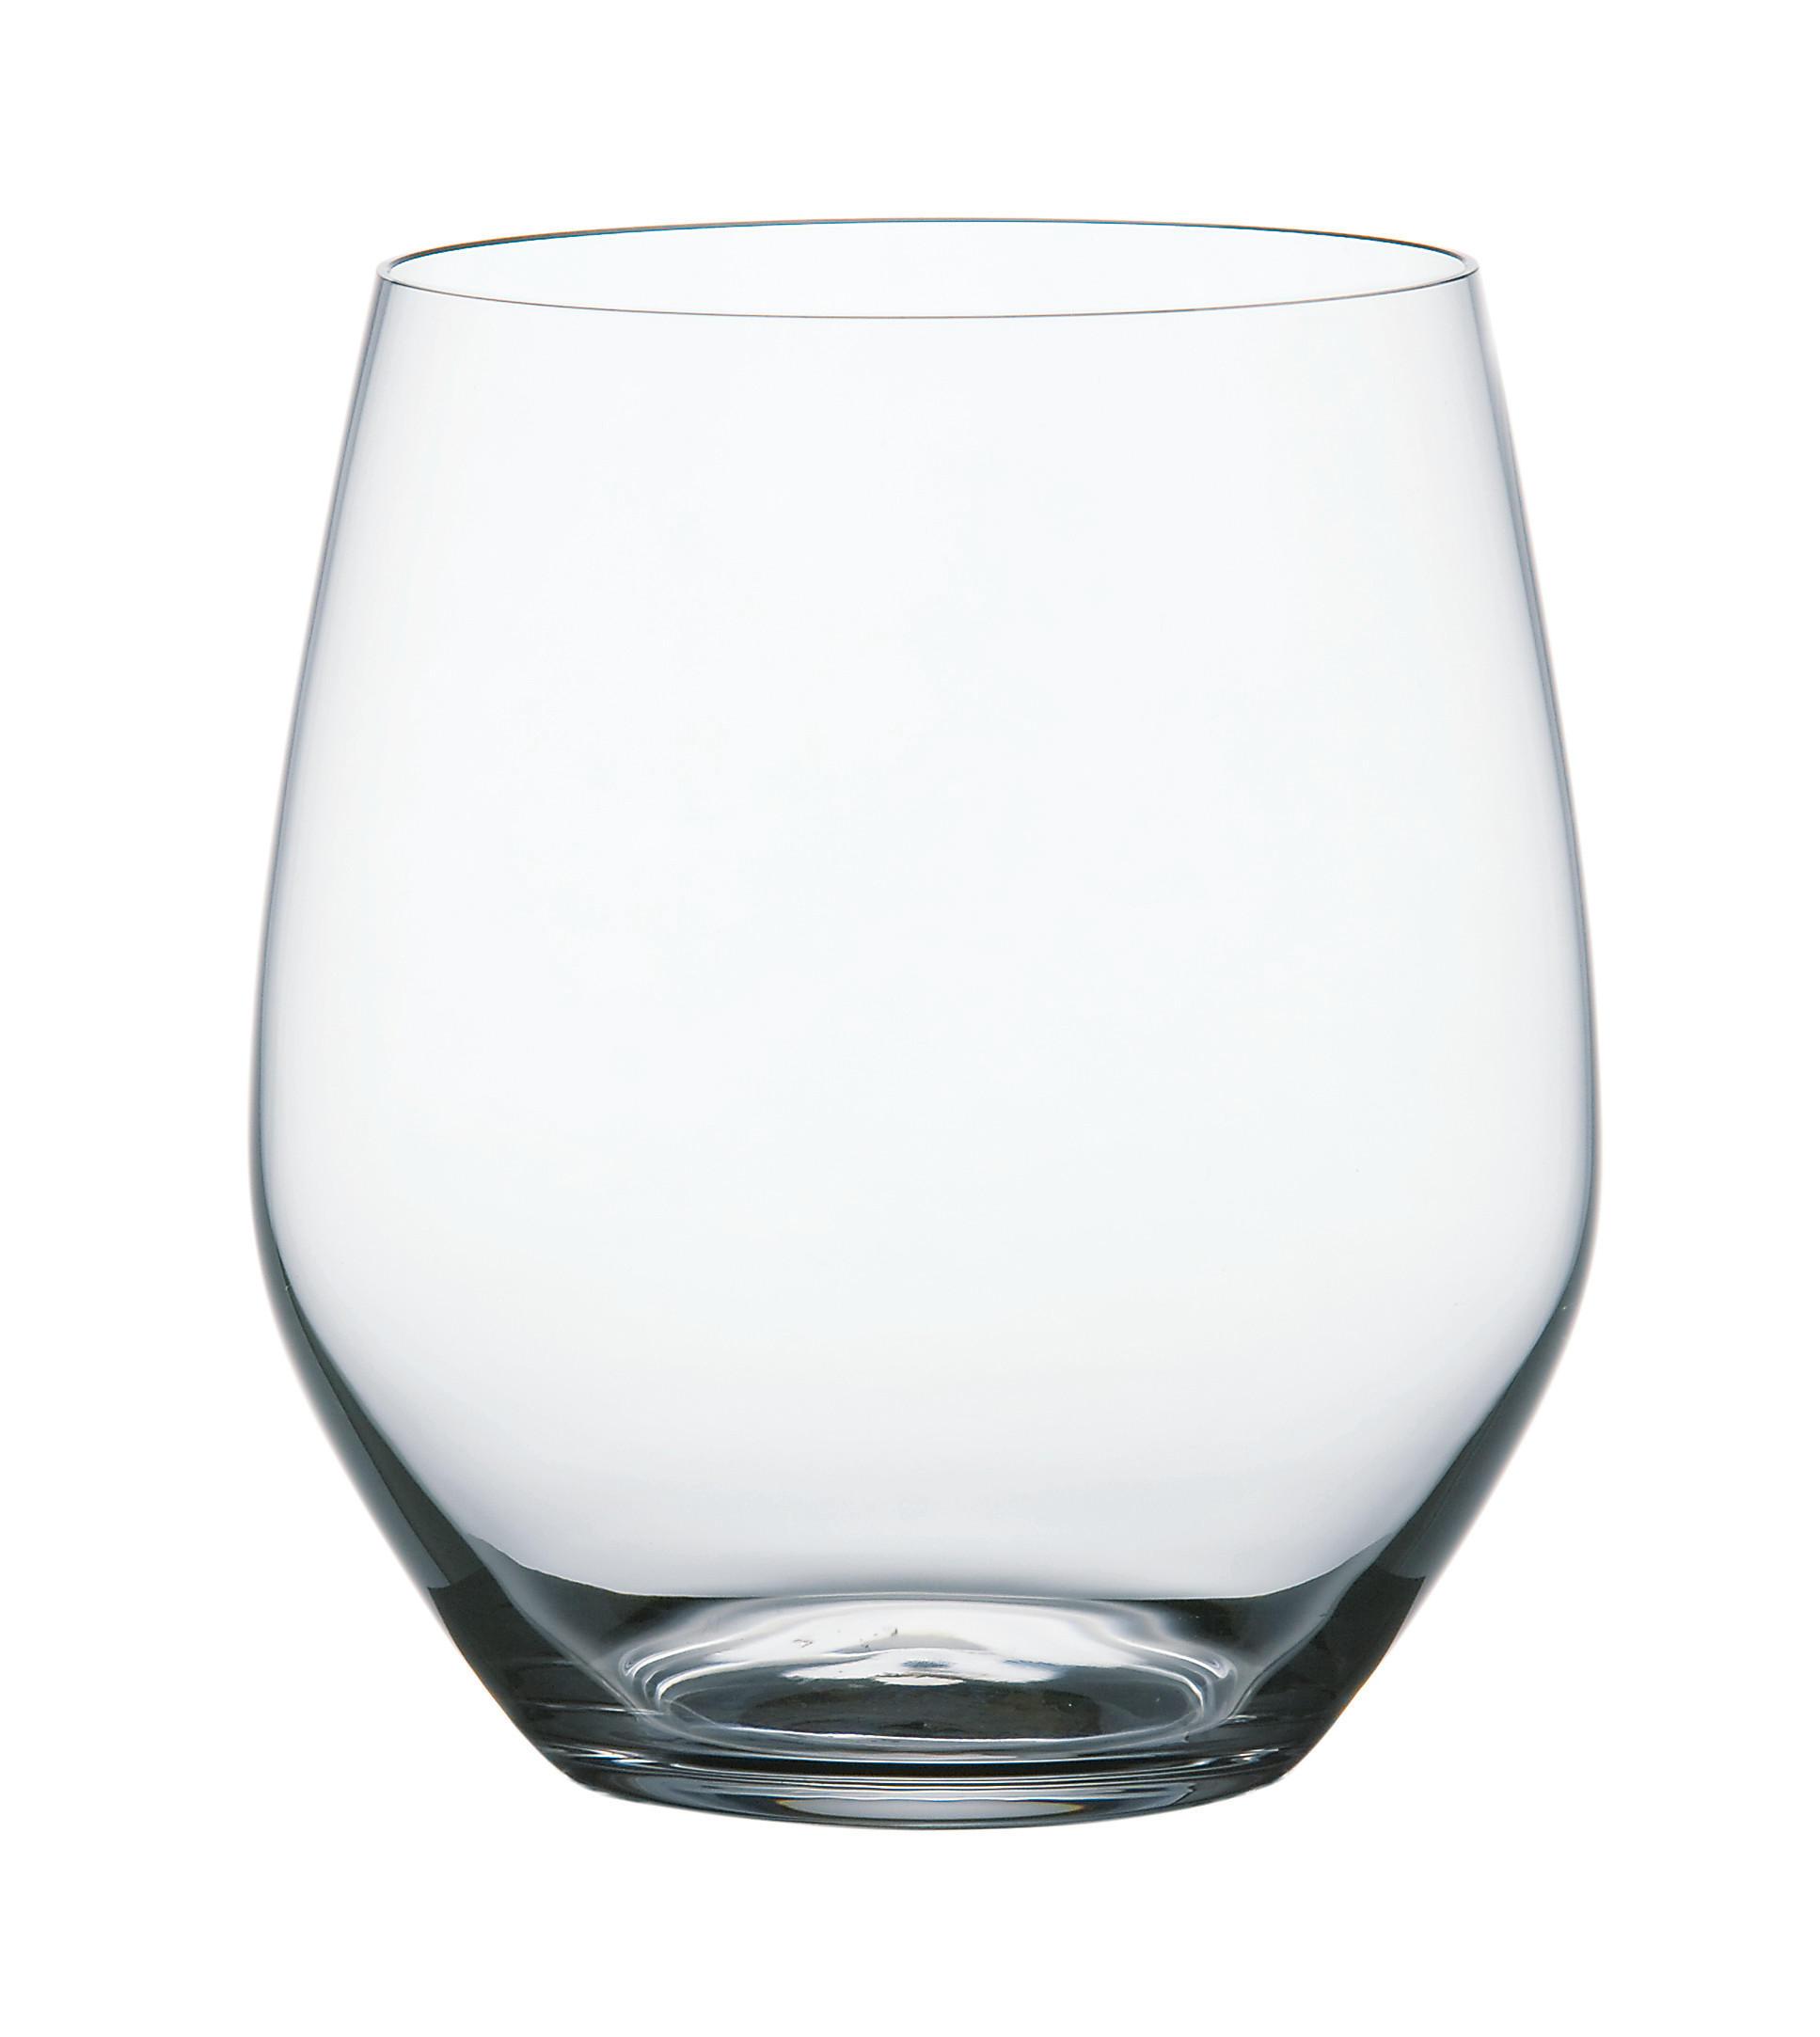 WASSERGLAS - Klar, Basics, Glas (9.5cm) - NACHTMANN